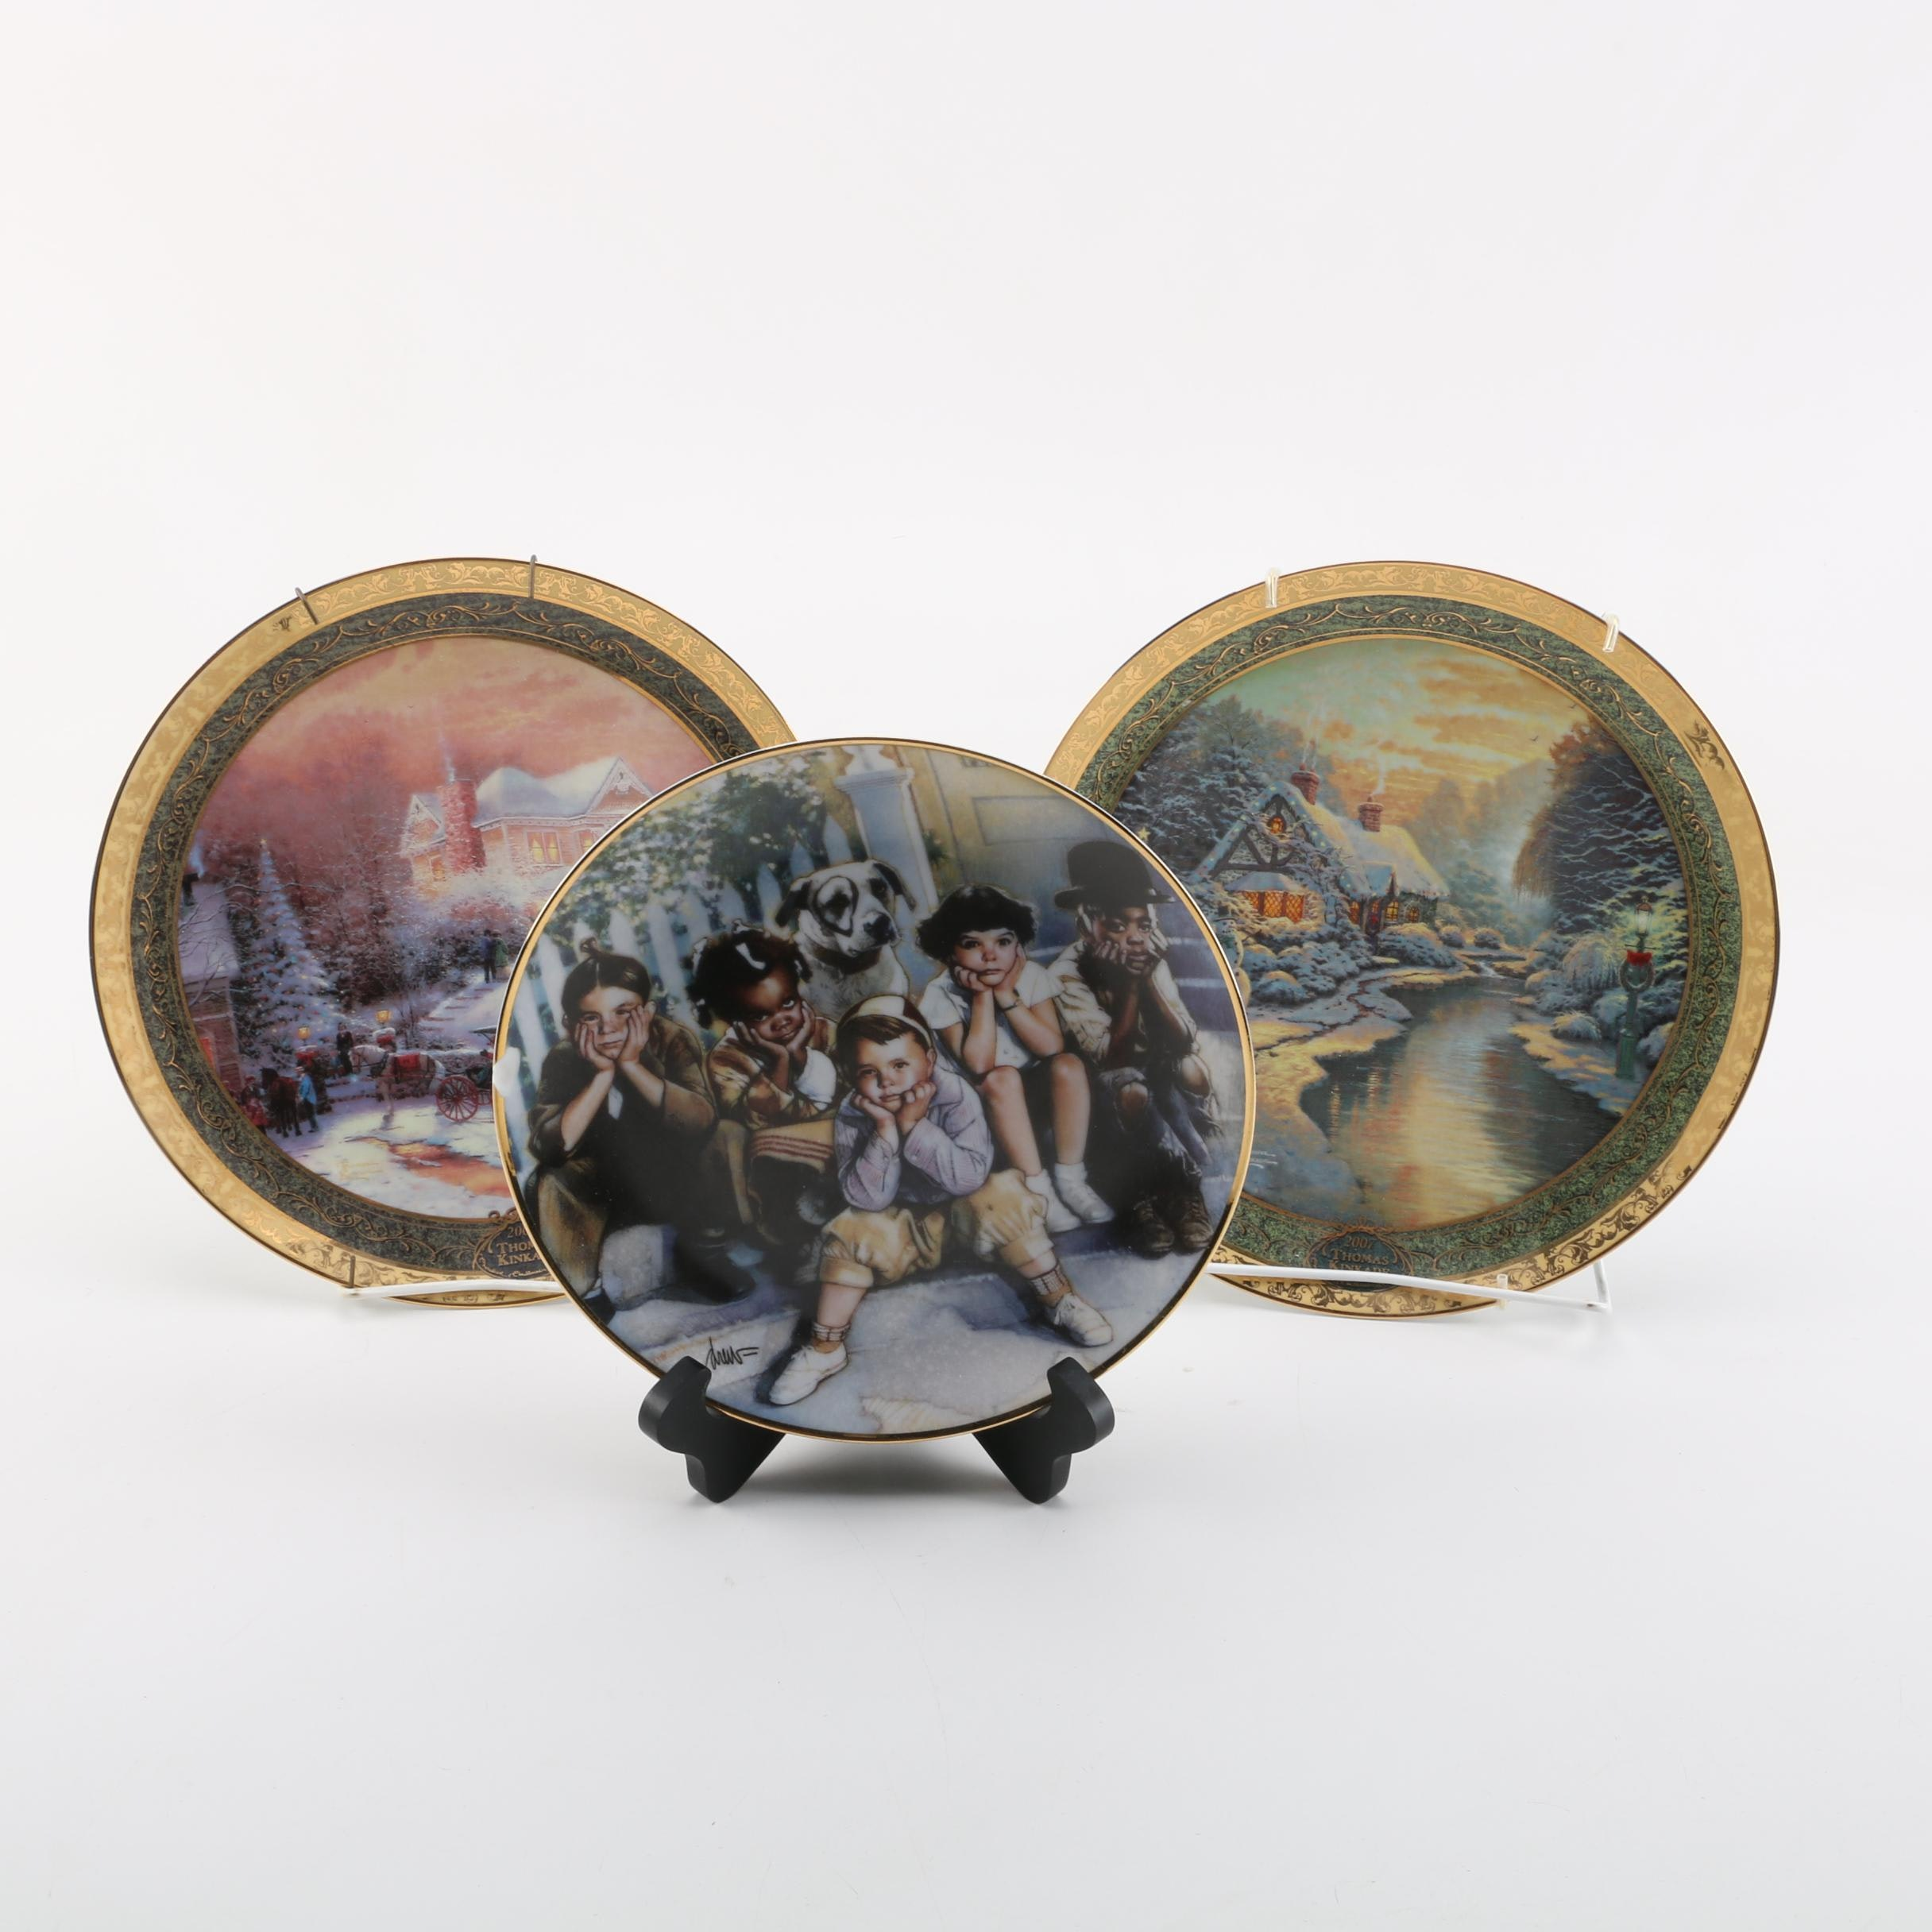 Porcelain Plates Including Thomas Kinkade